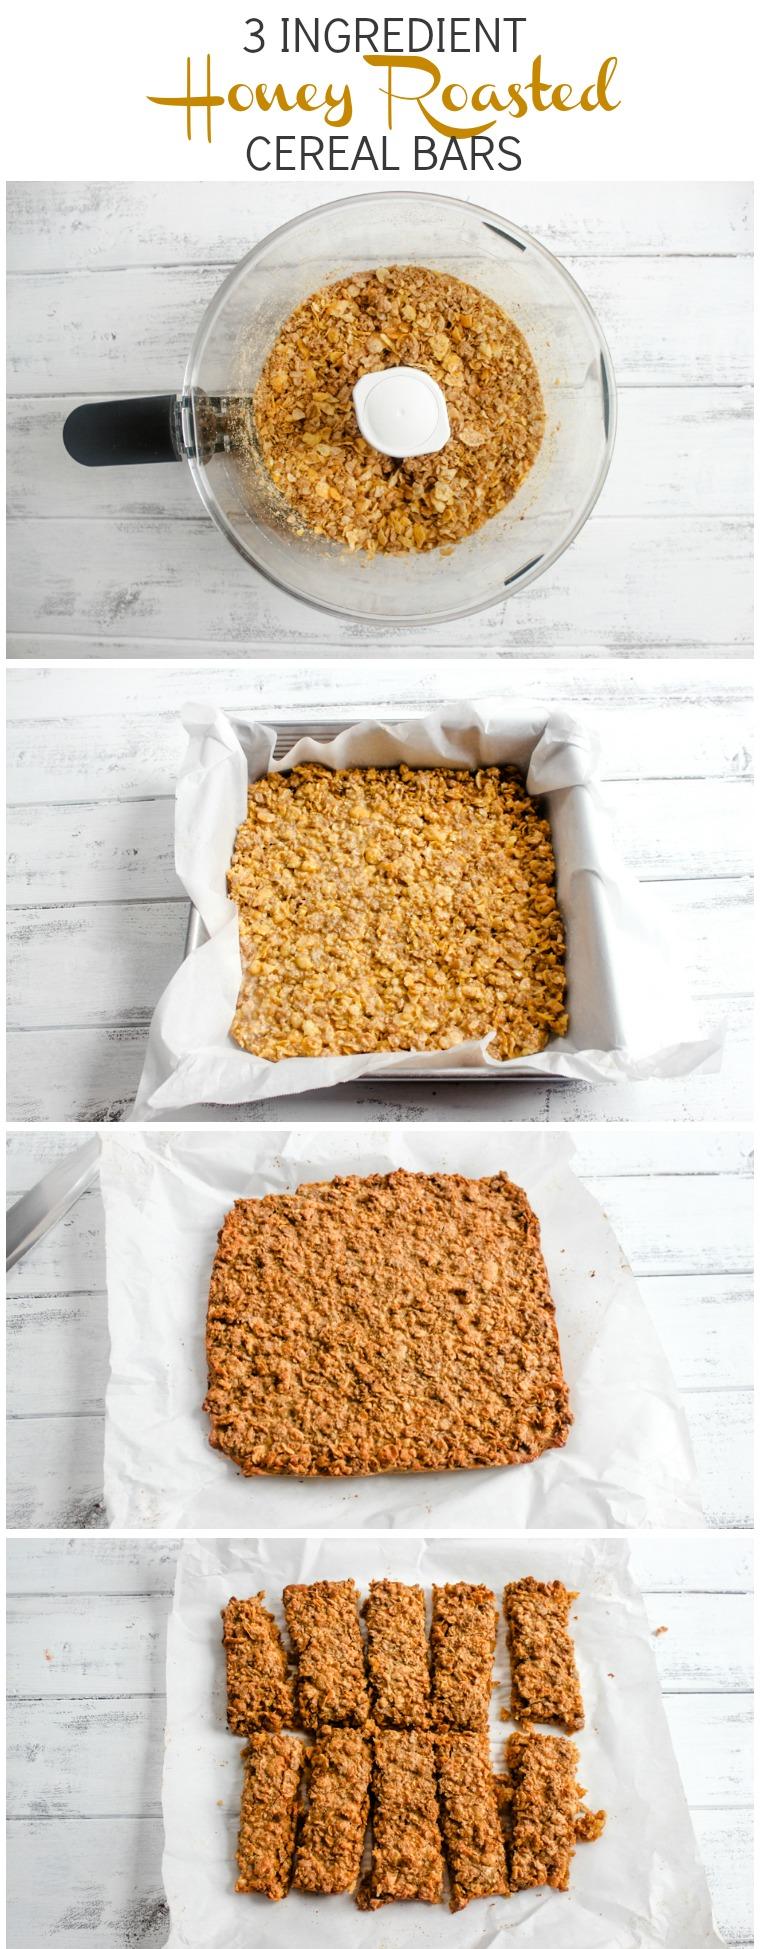 3 Ingredient Honey Roasted Cereal Bars